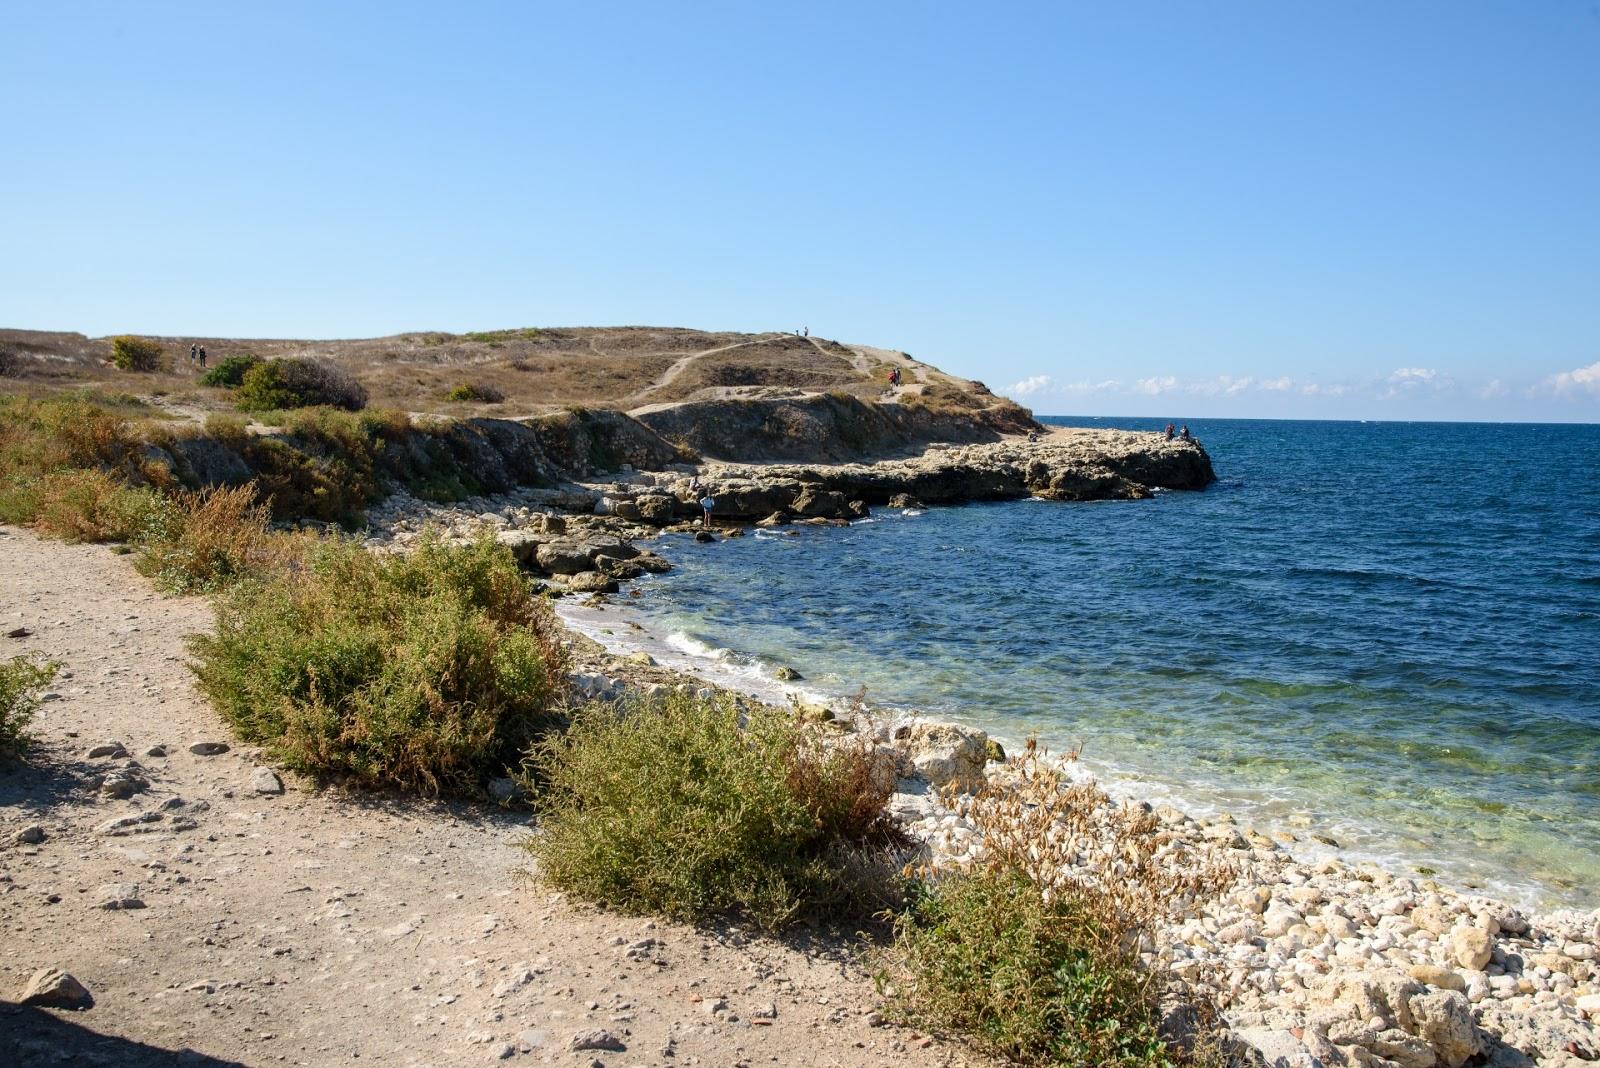 Черное море у Херсонеса. Севастопль